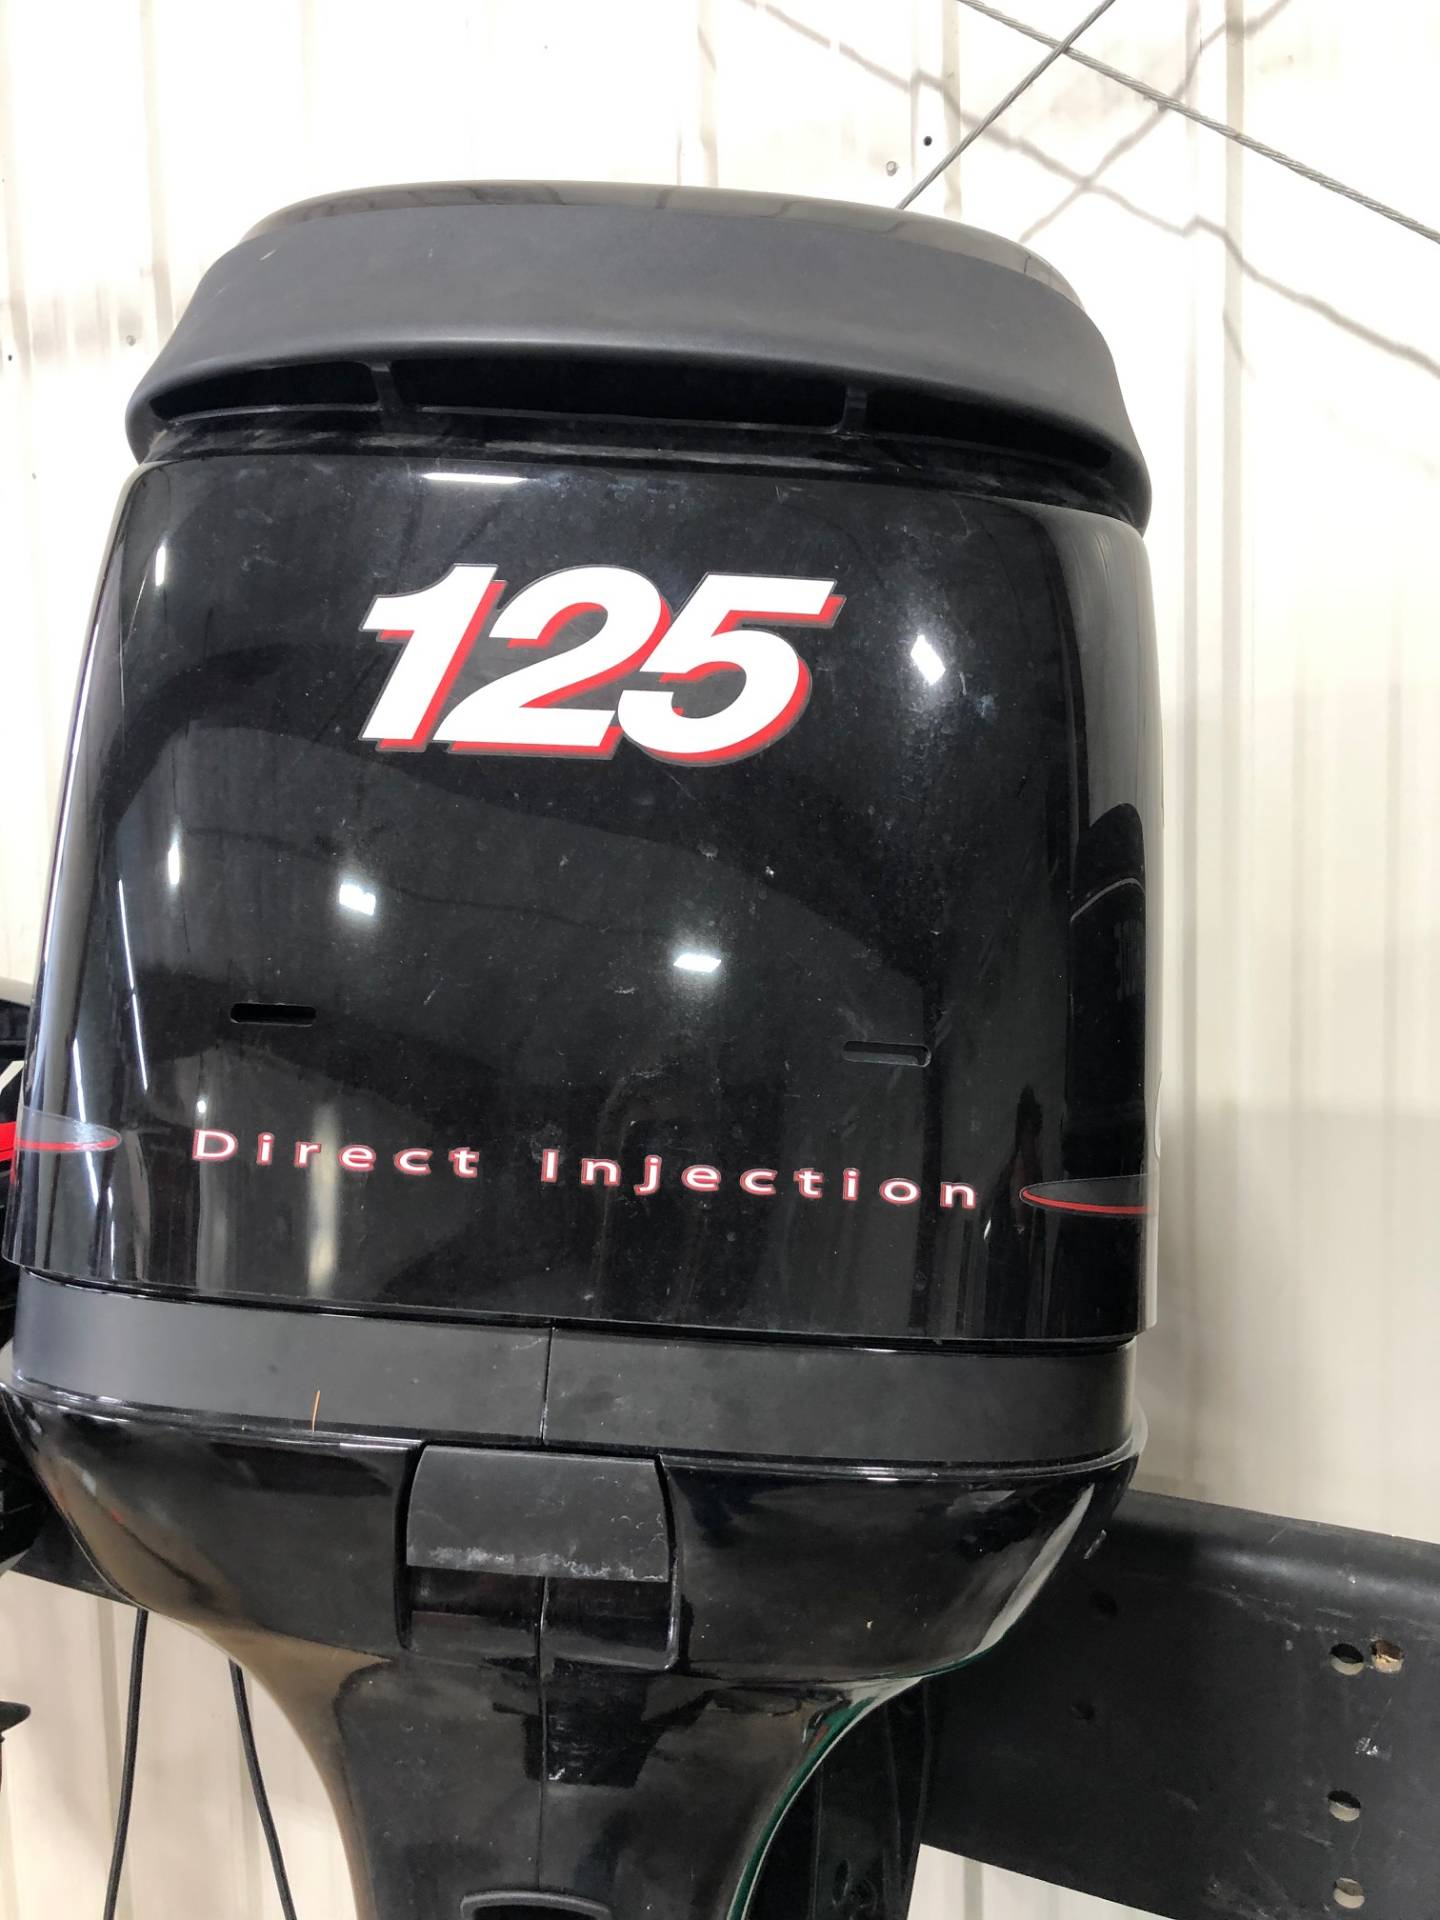 Used Mercury Optimax 125xl Boat Engines In Trego Wi N A Black